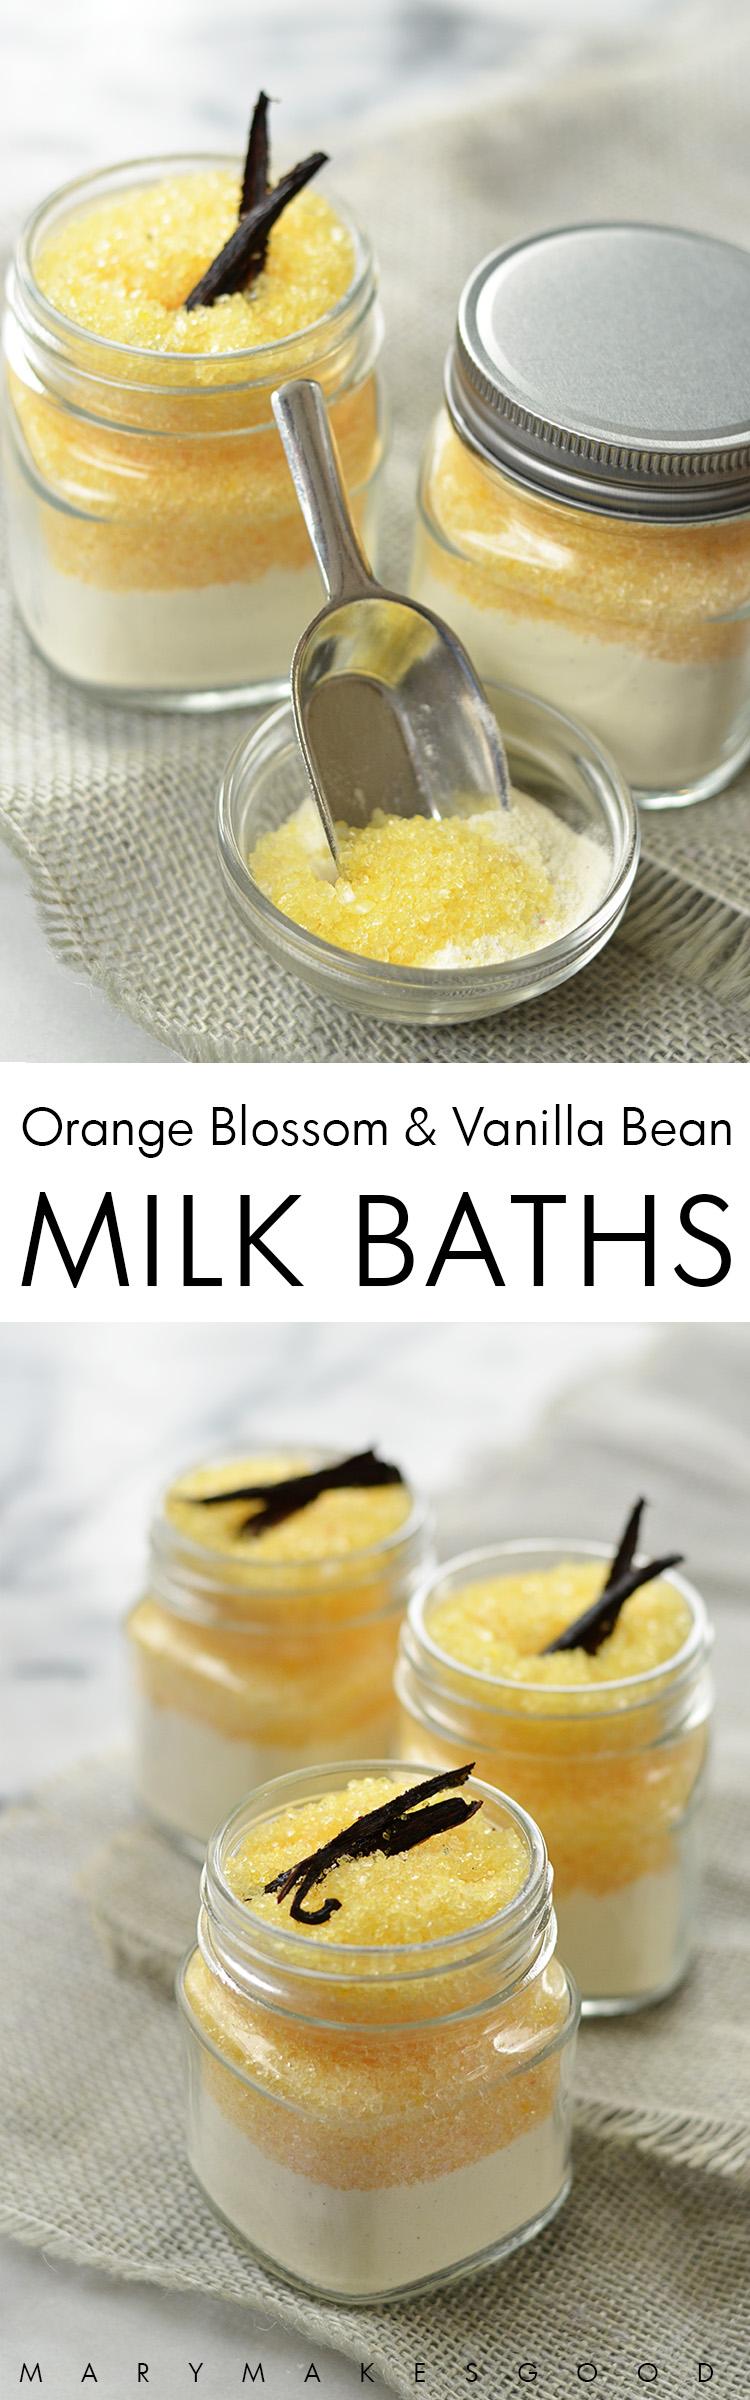 Orange Blossom Vanilla Bean Milk Bath